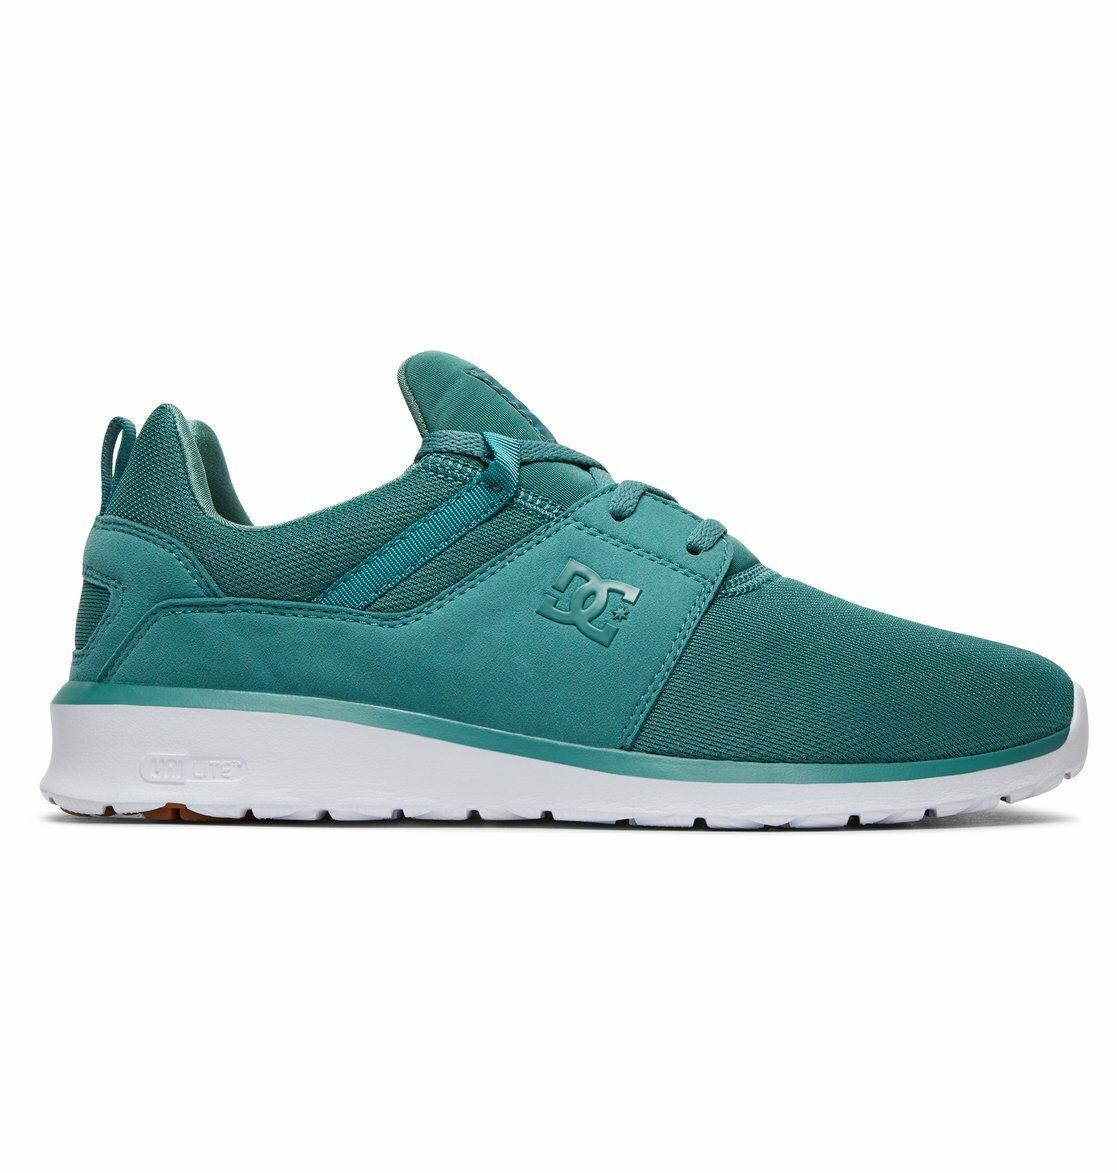 DC shoes     Heathrow grass 0a2e22